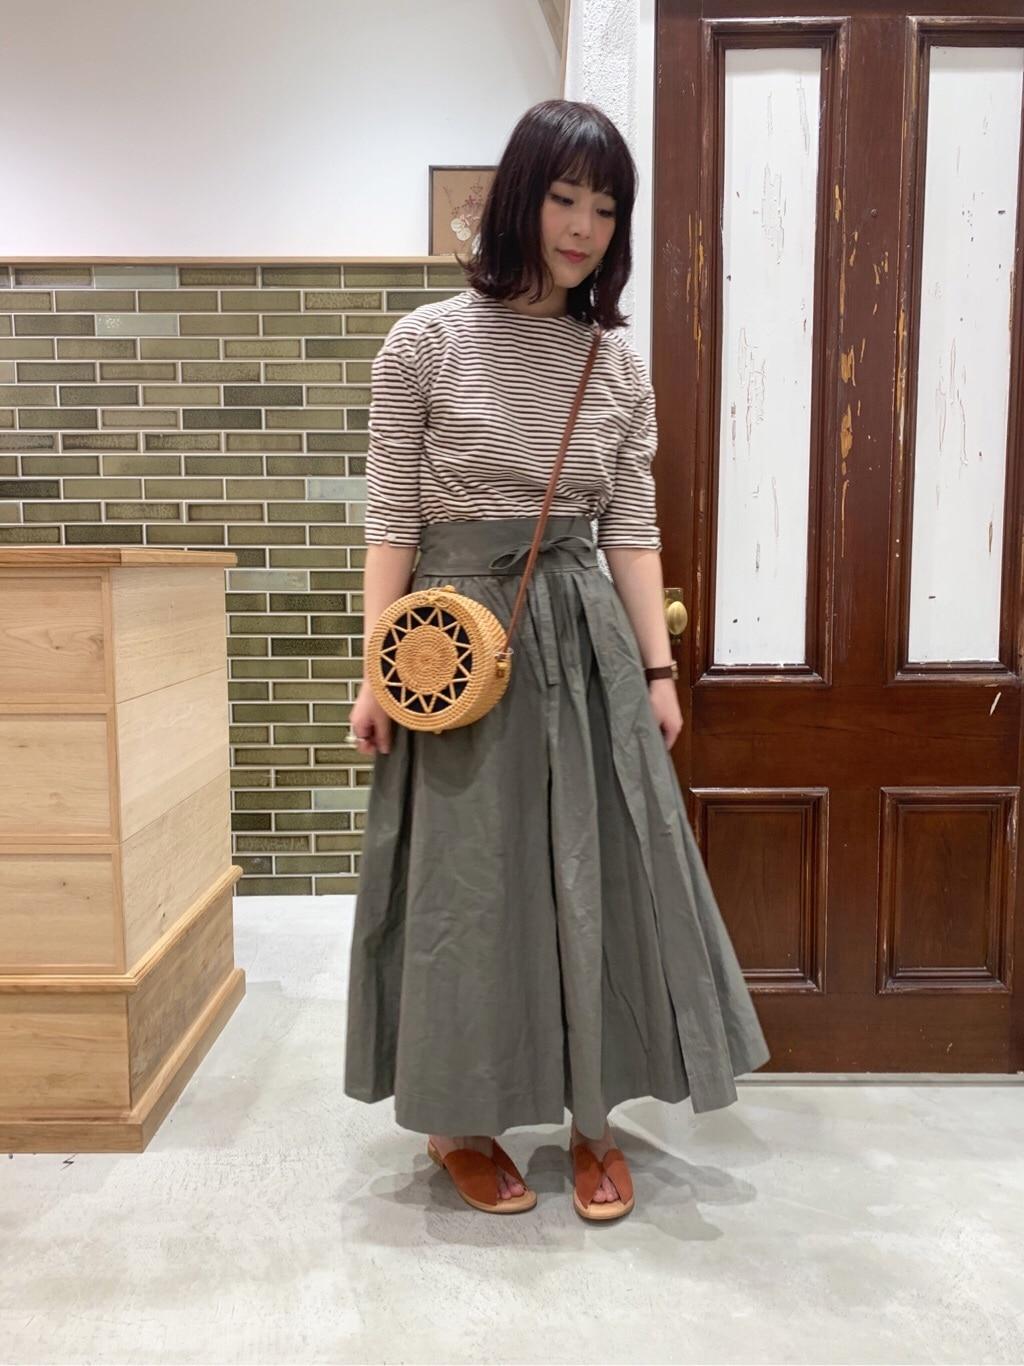 chambre de charme 横浜ジョイナス 身長:162cm 2020.05.07